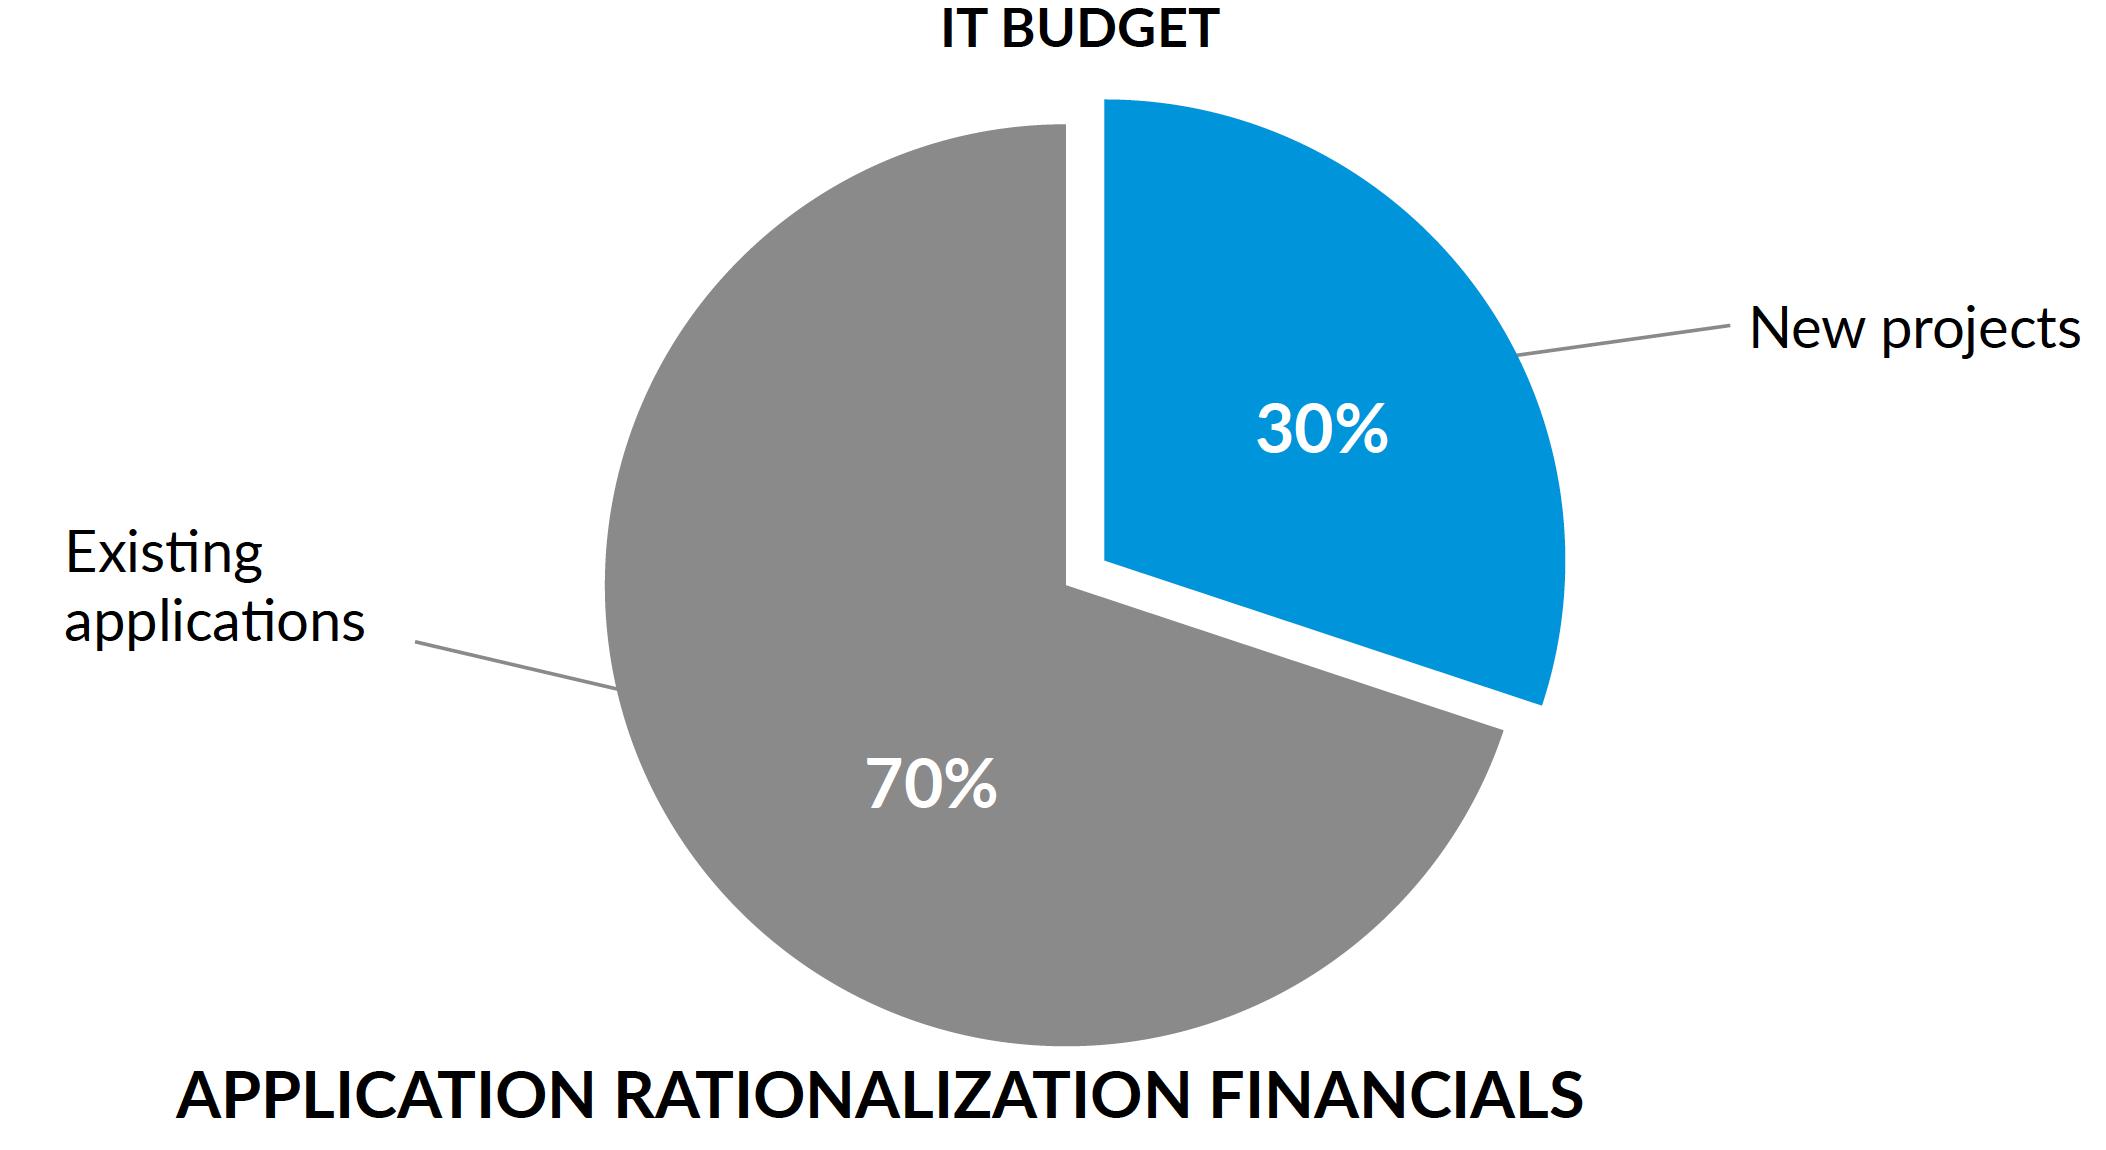 IT budget split